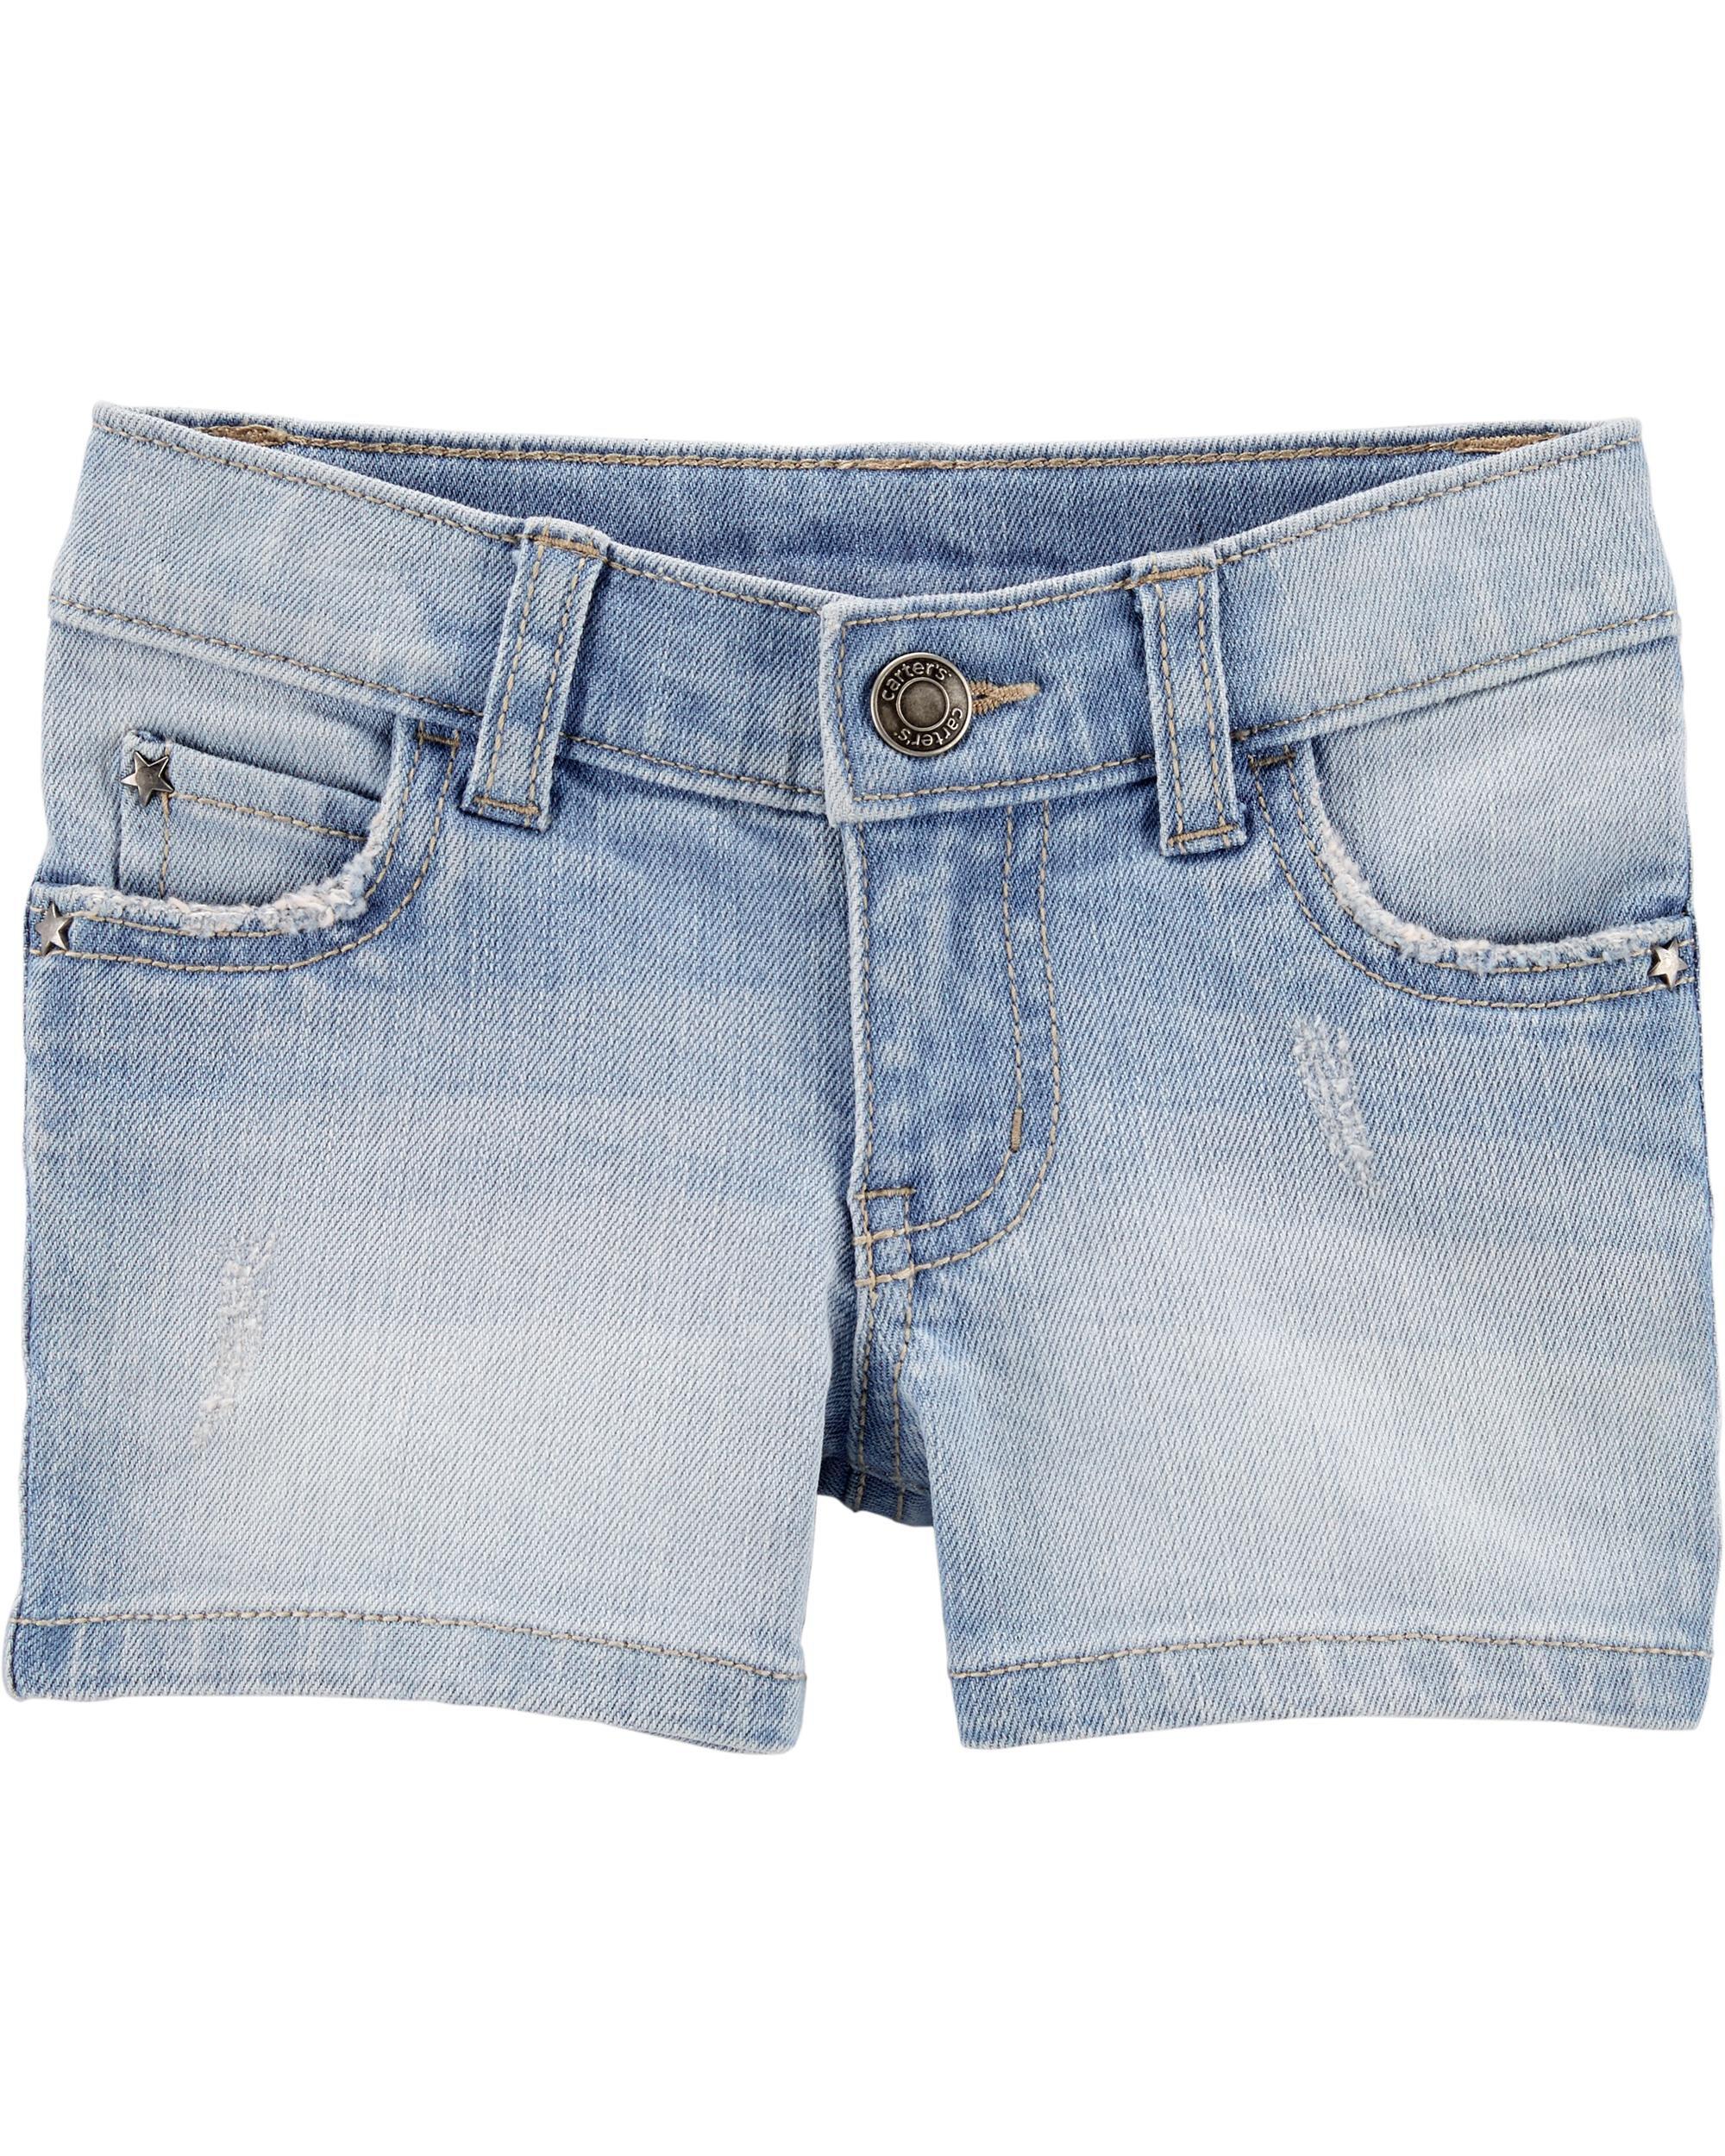 *Clearance*  Americana Denim Shorts